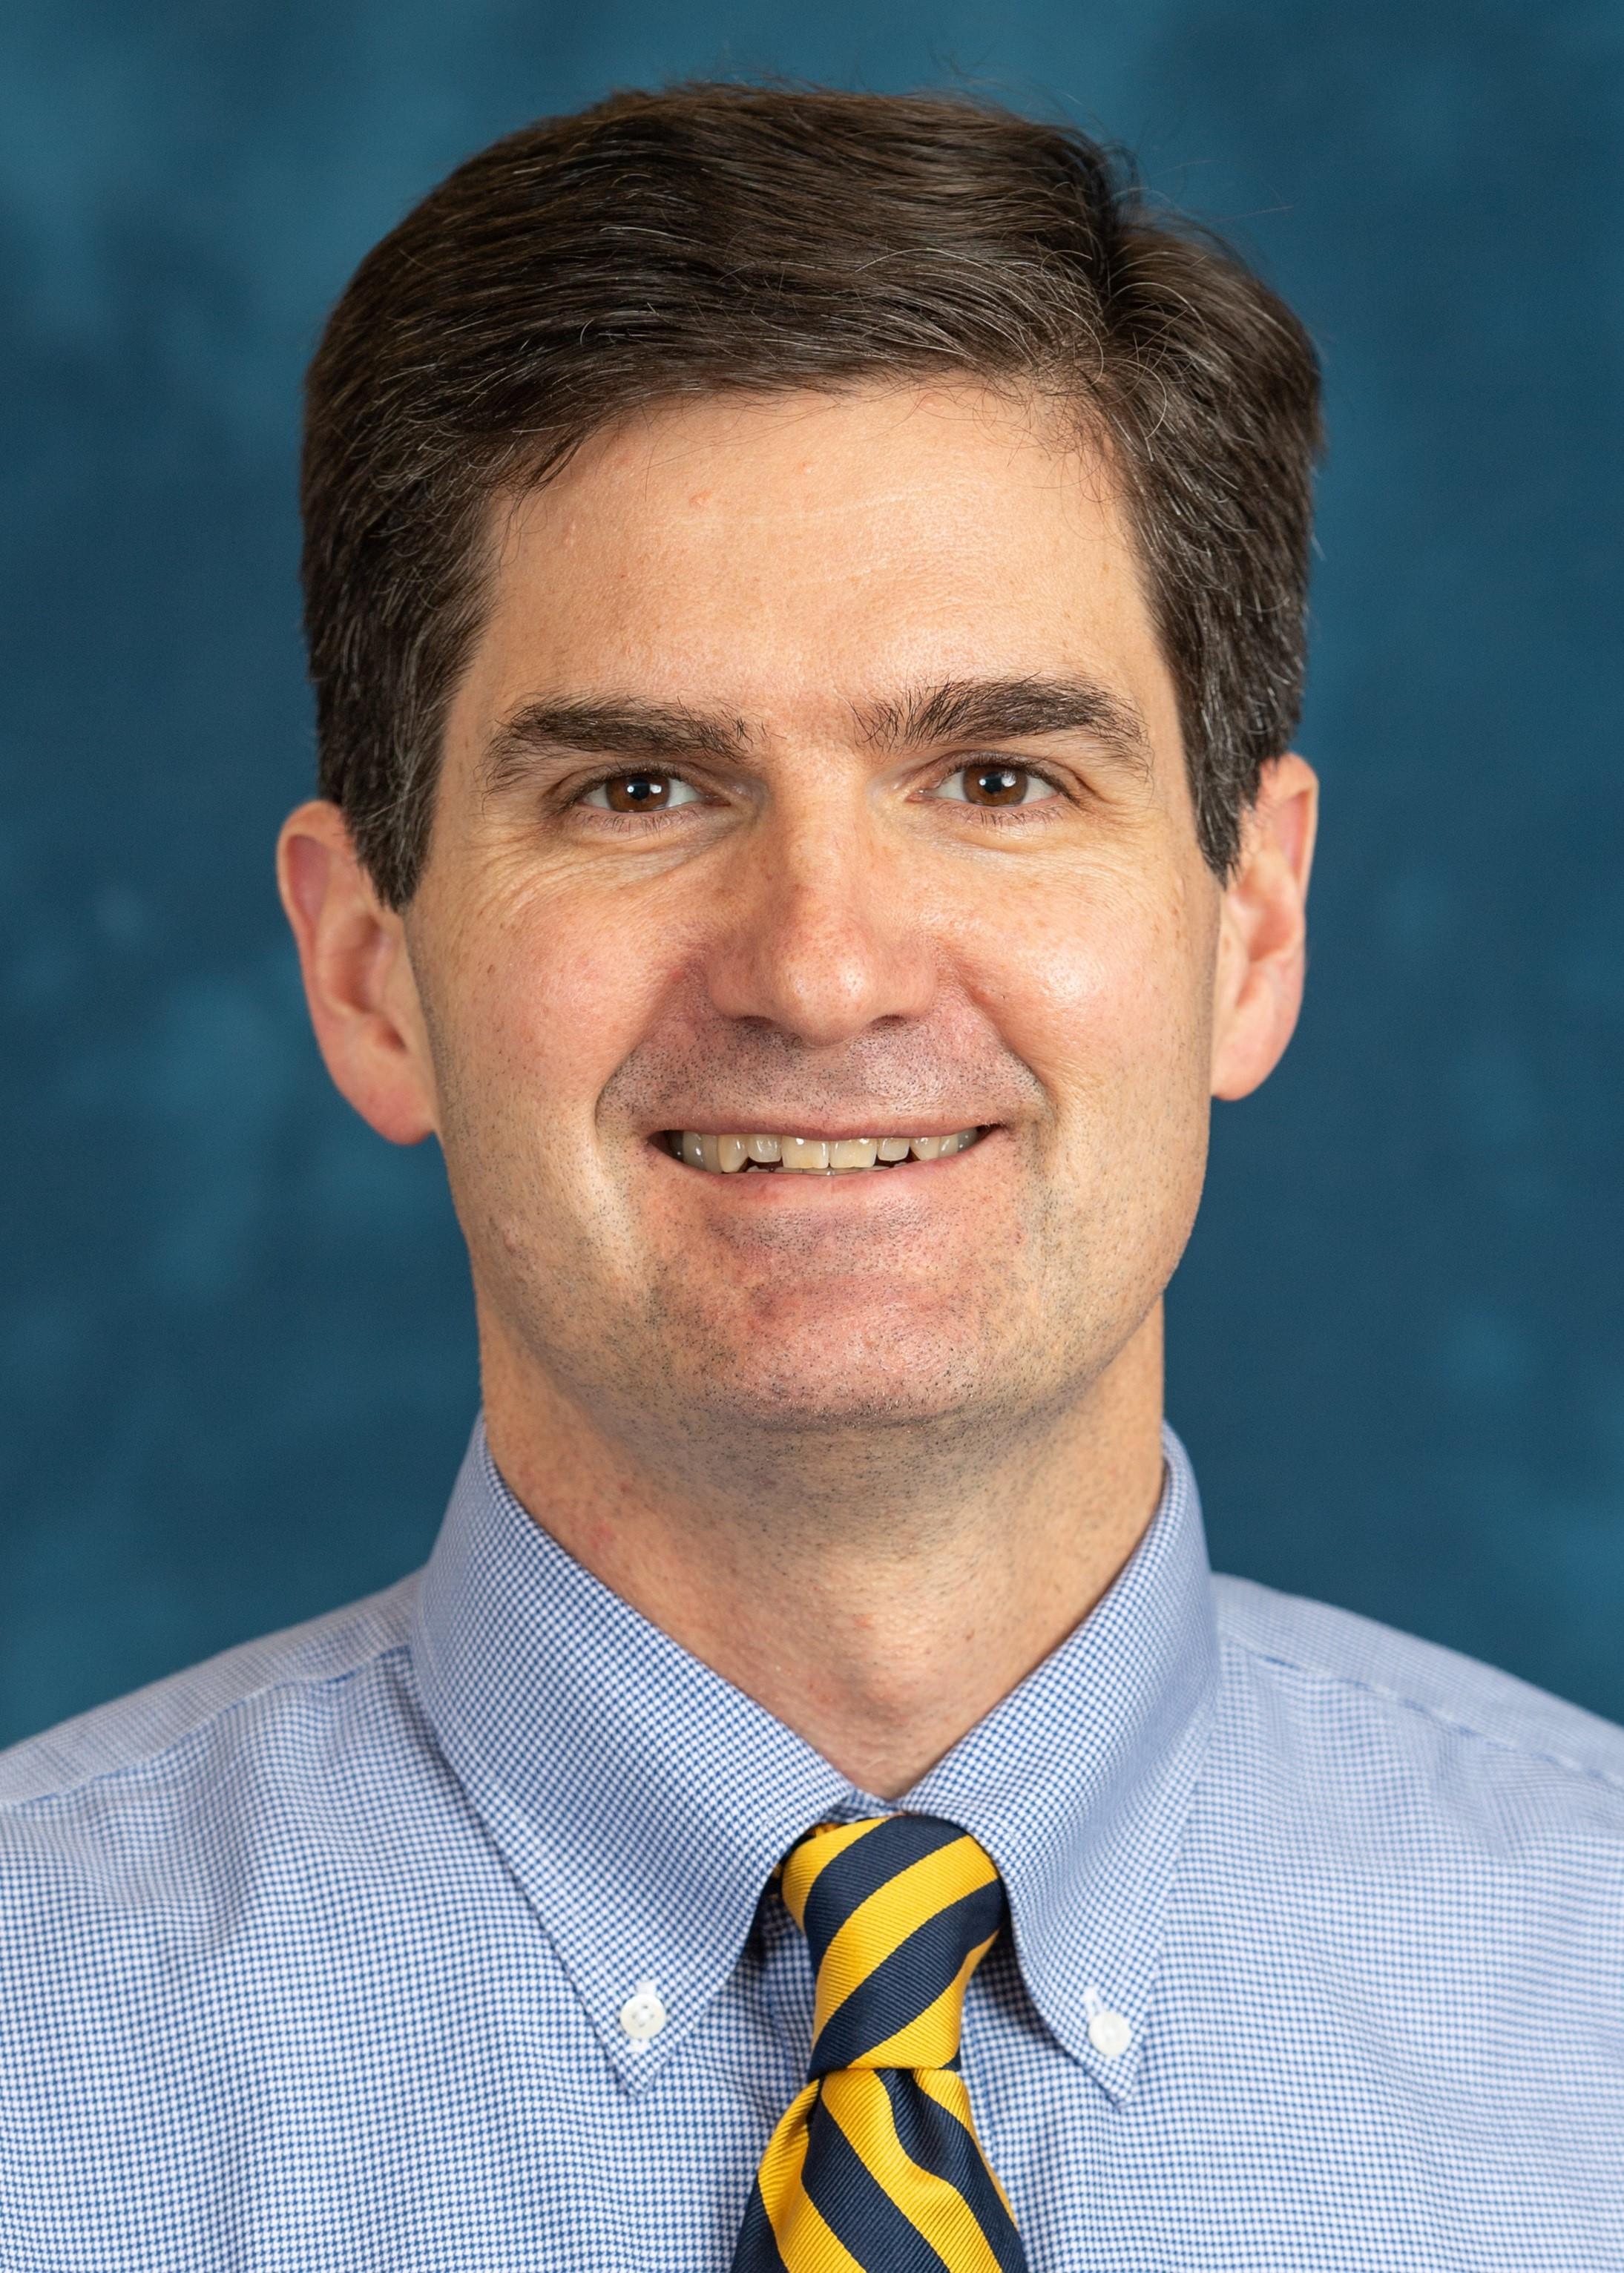 Daniel M. Morgan, MD